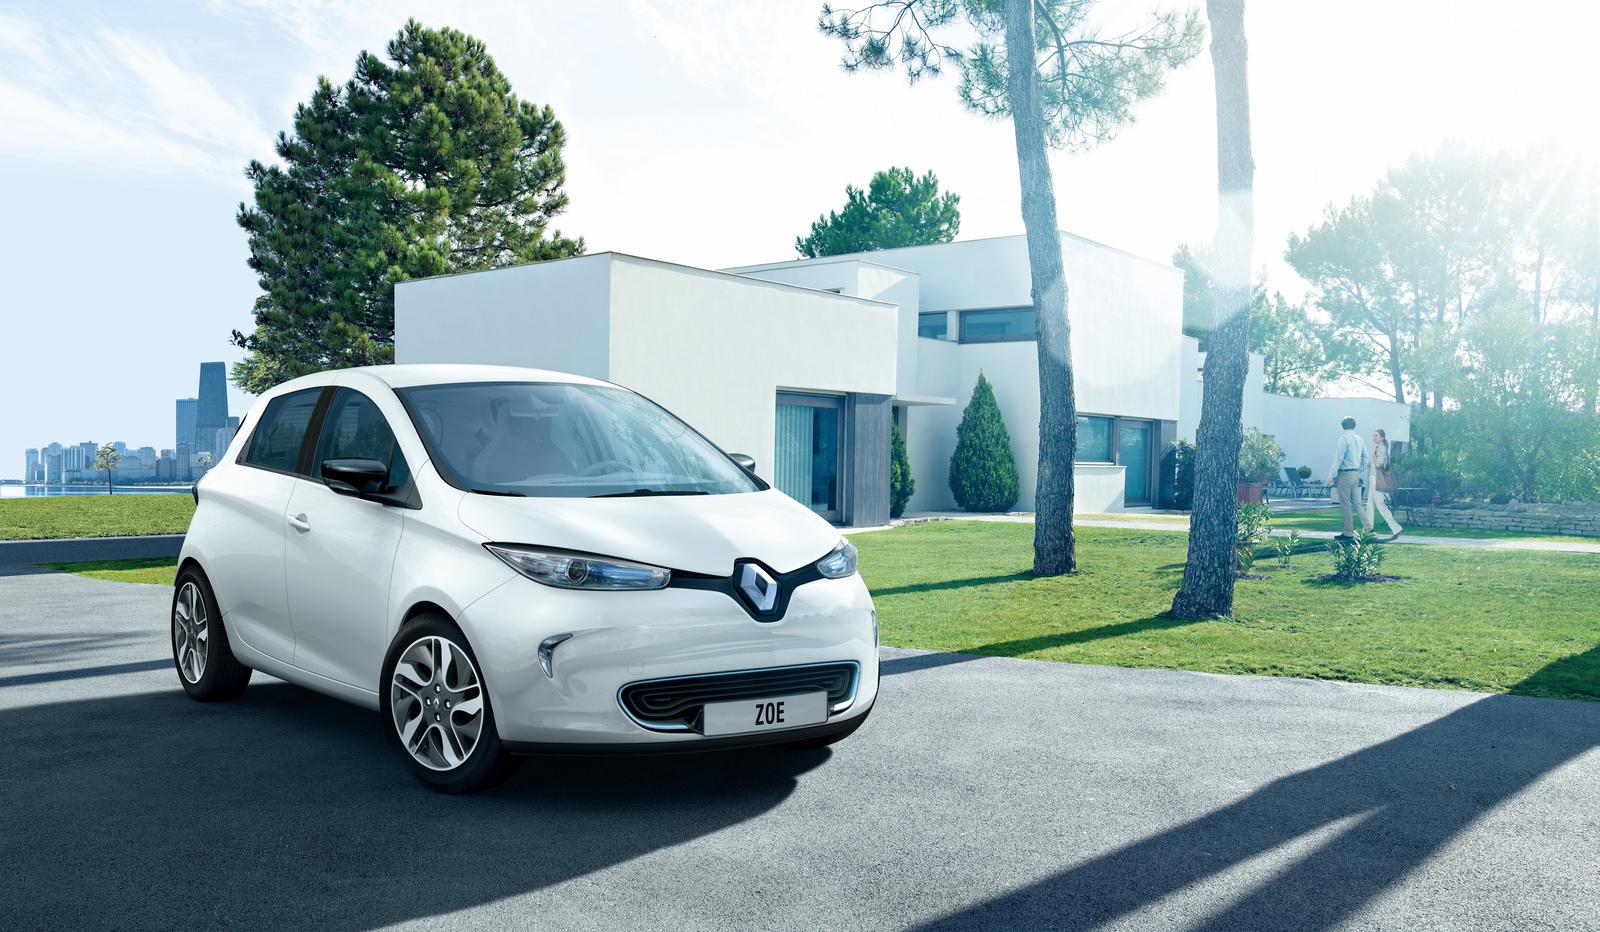 Zoe 2012 (Image: Renault)